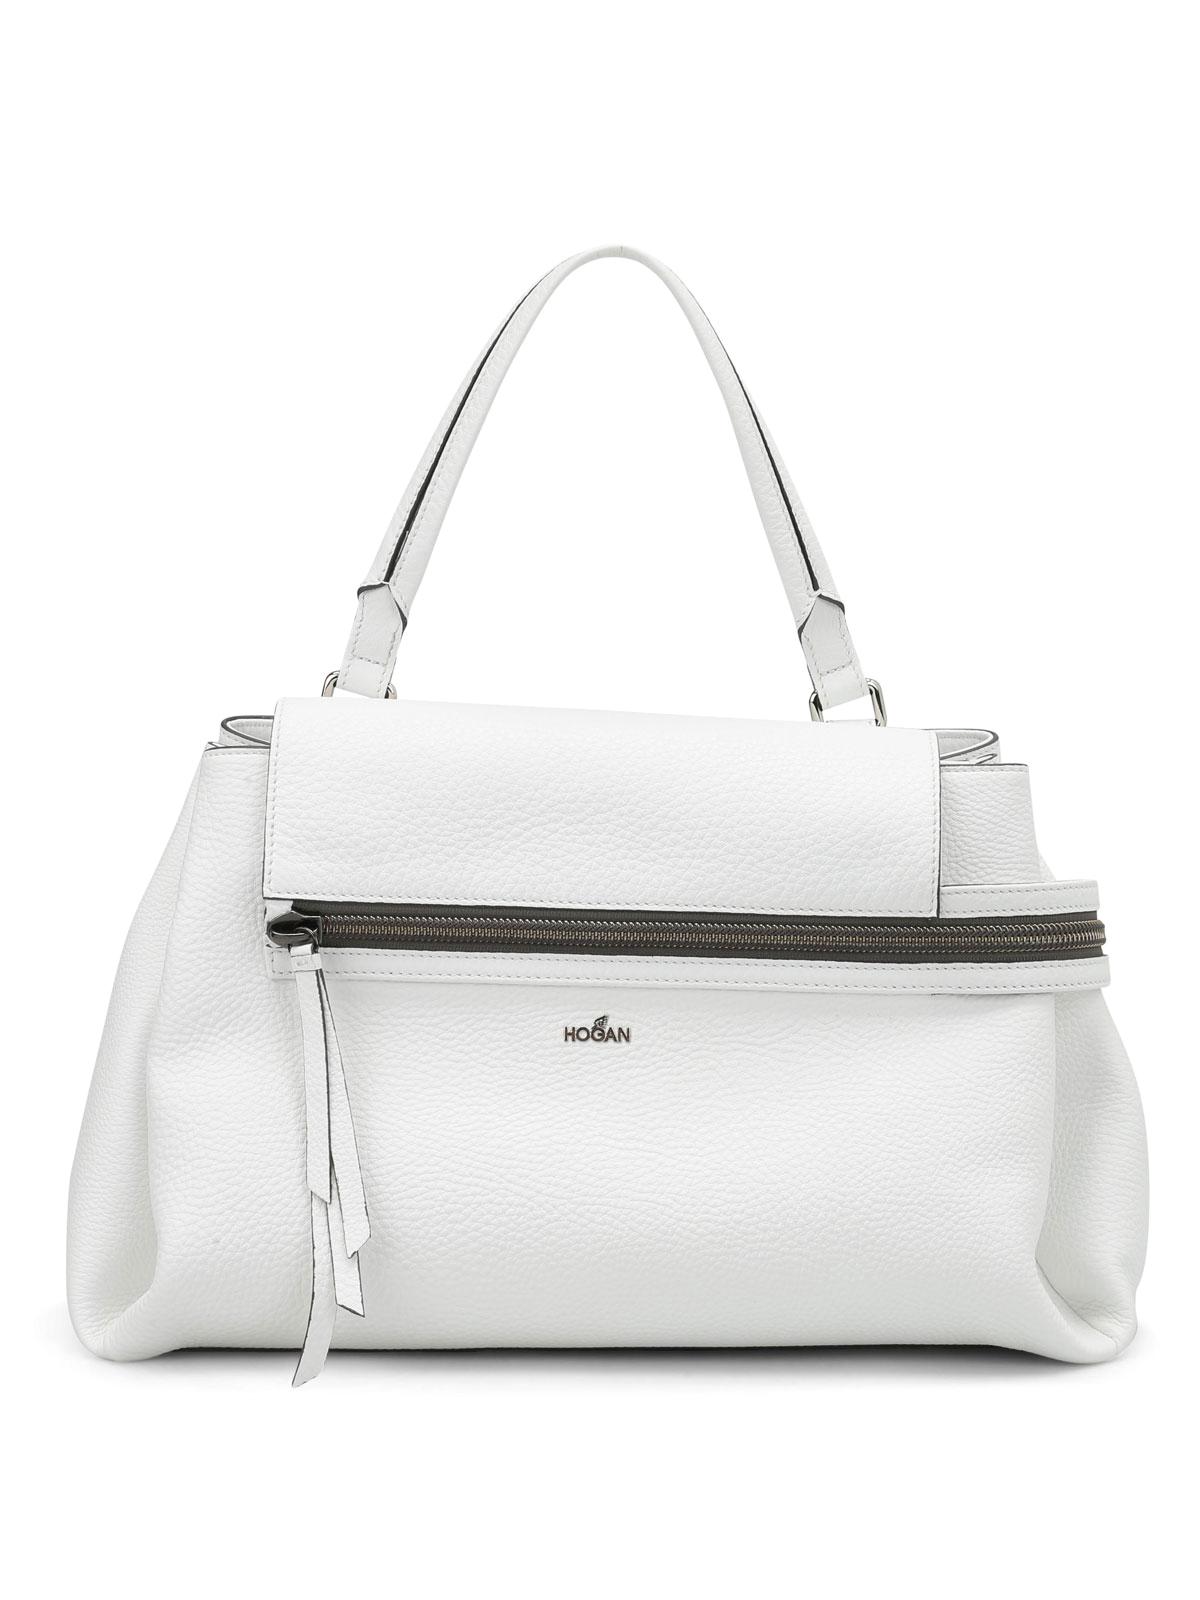 hogan shopping bag